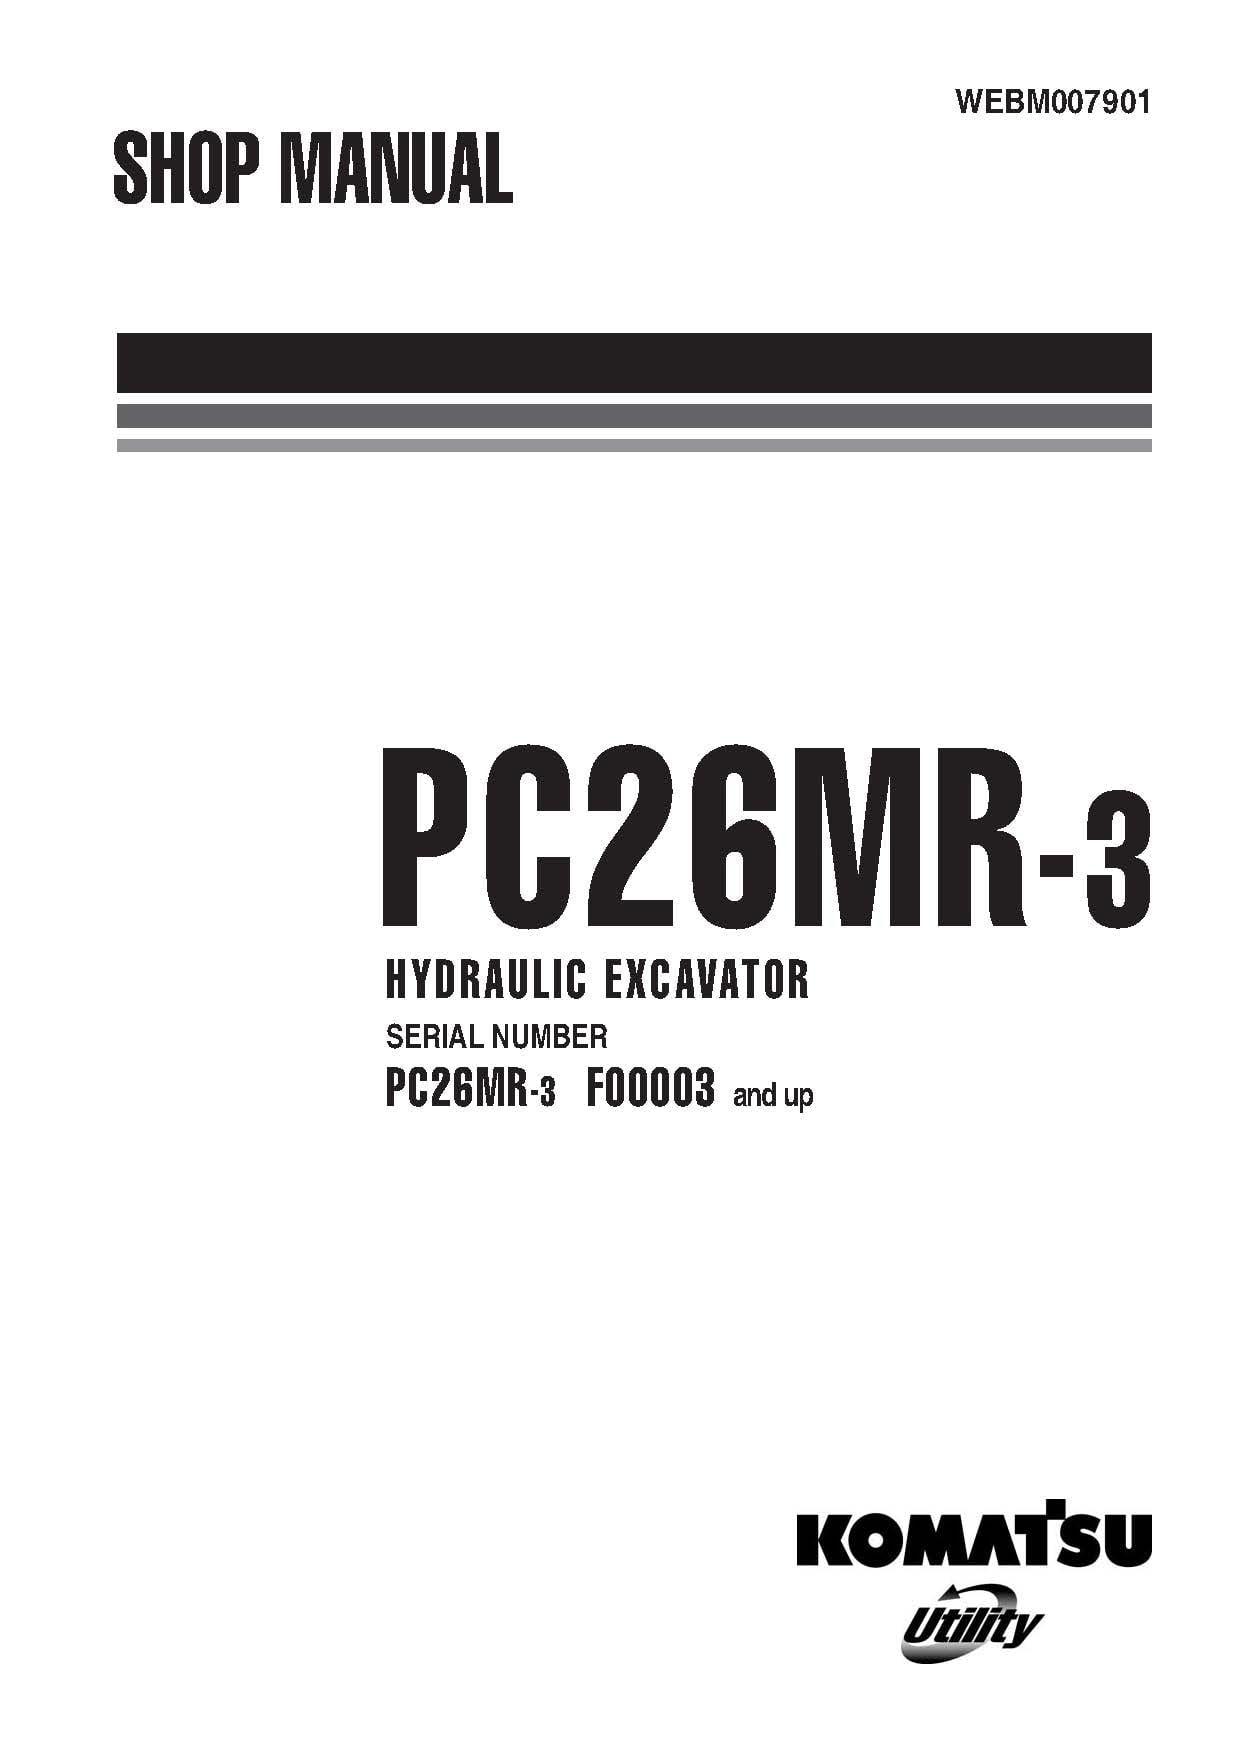 Komatsu PC26MR-3 Hydraulic Excavator Workshop Repair